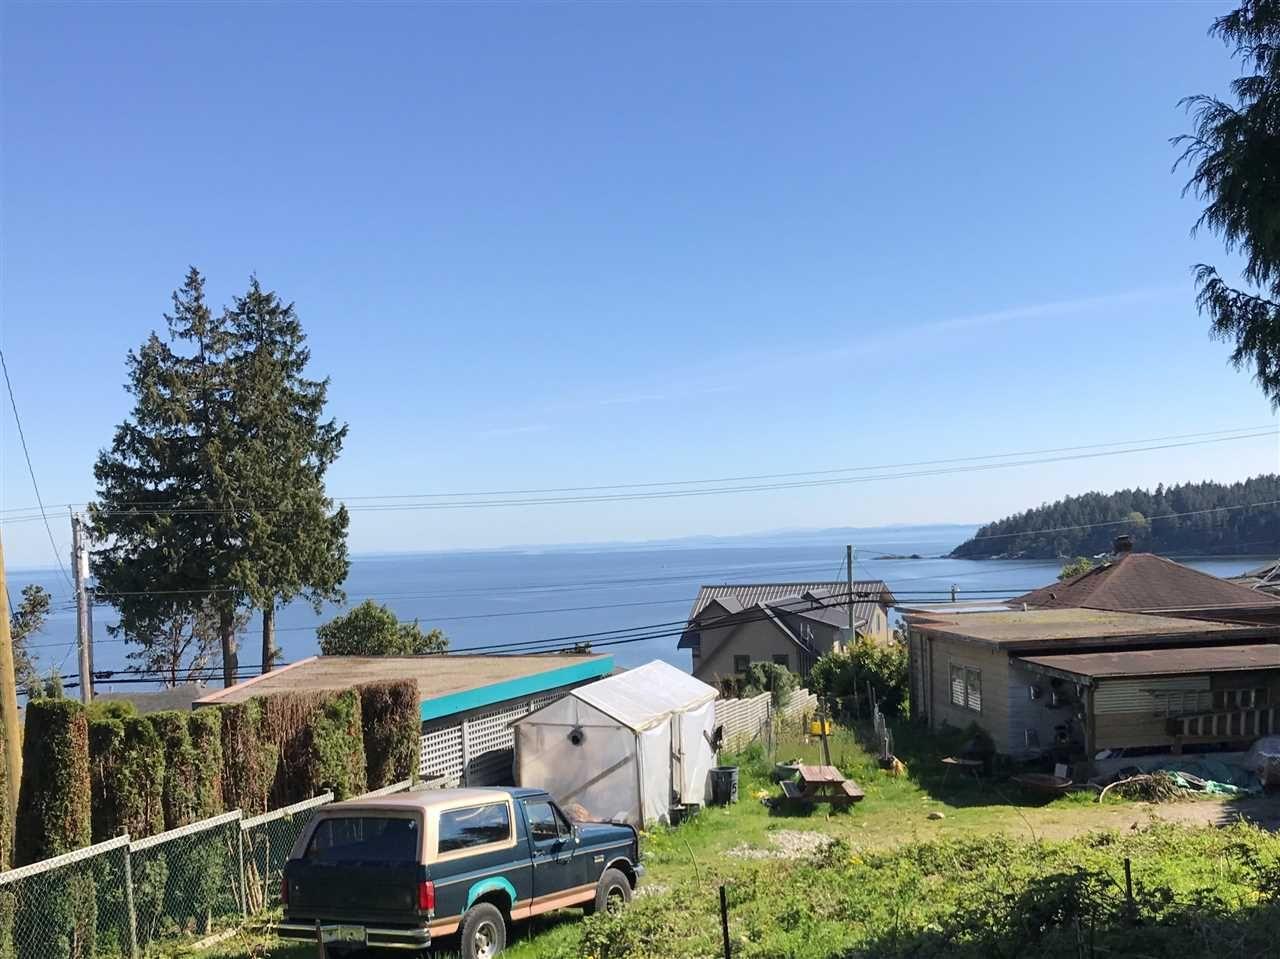 Main Photo: 6220 SUNSHINE COAST Highway in Sechelt: Sechelt District House for sale (Sunshine Coast)  : MLS®# R2140615